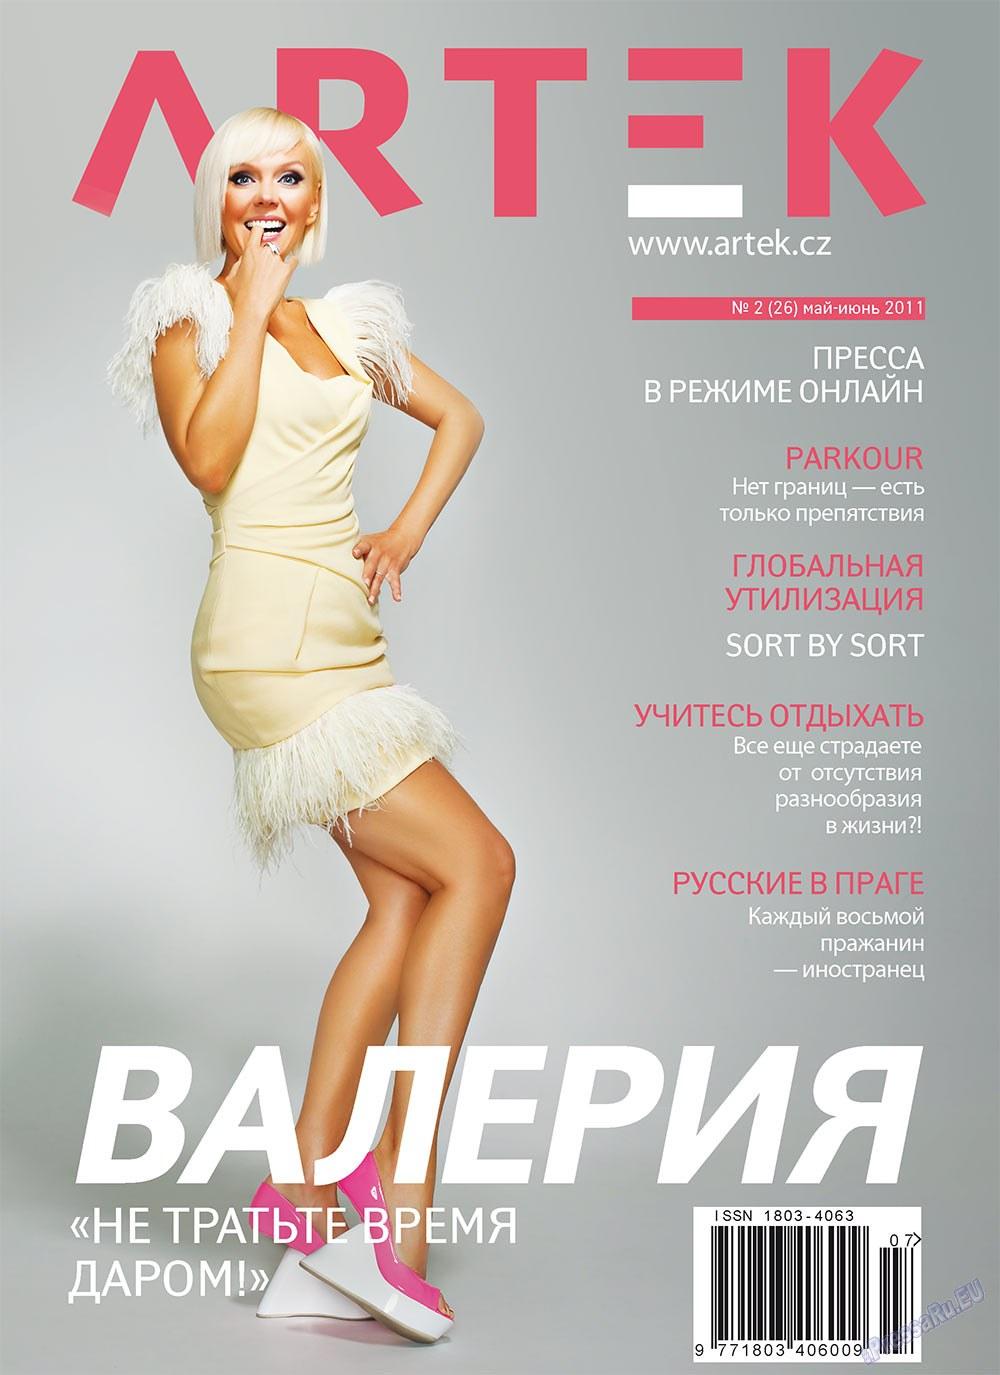 Артек (журнал). 2011 год, номер 2, стр. 1